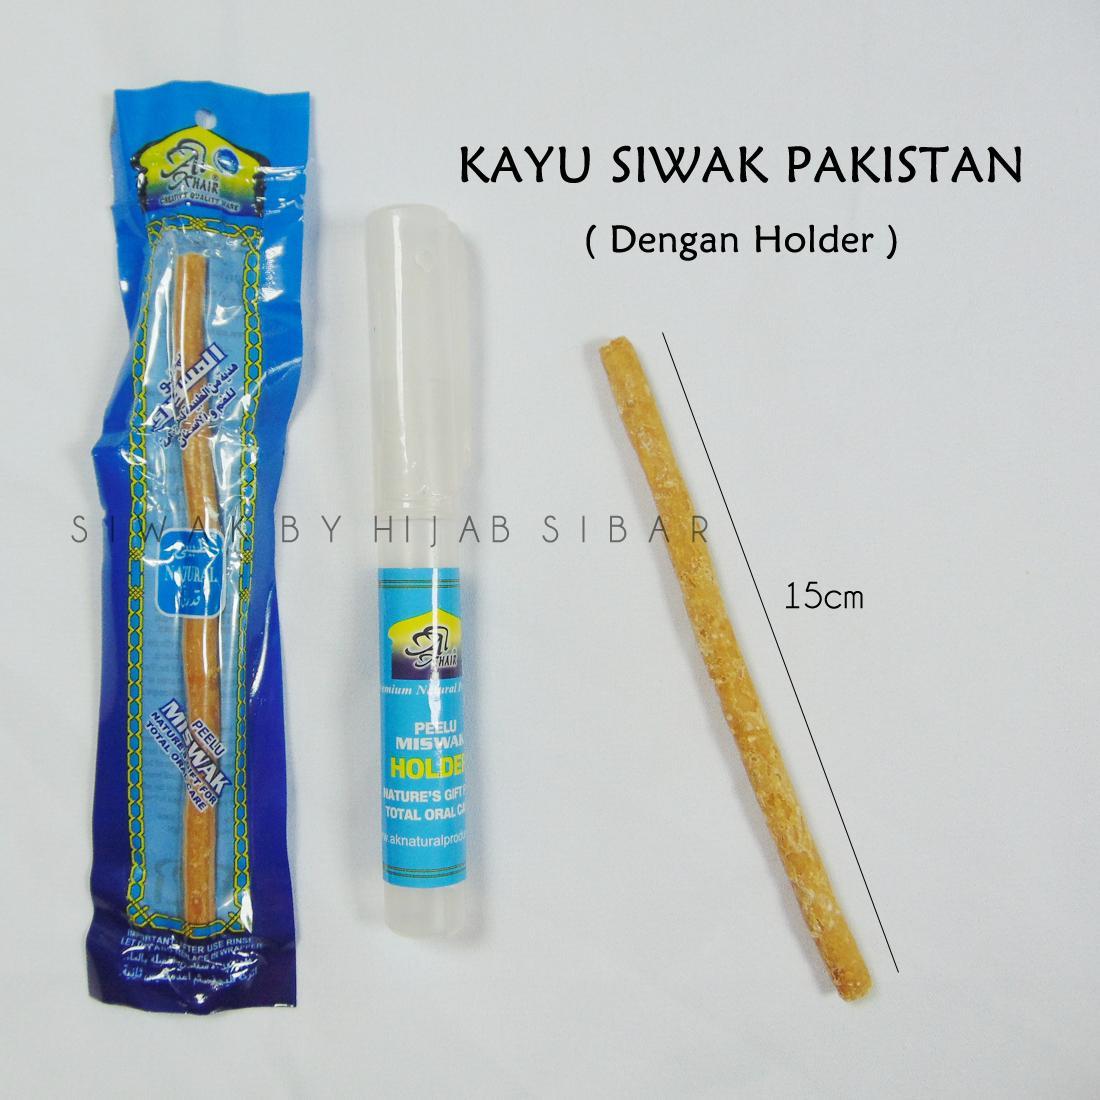 Kayu Siwak Miswak Al-Khair Pakistan Original Dengan Holder / By Hijab Sibar By Hijab Sibar.